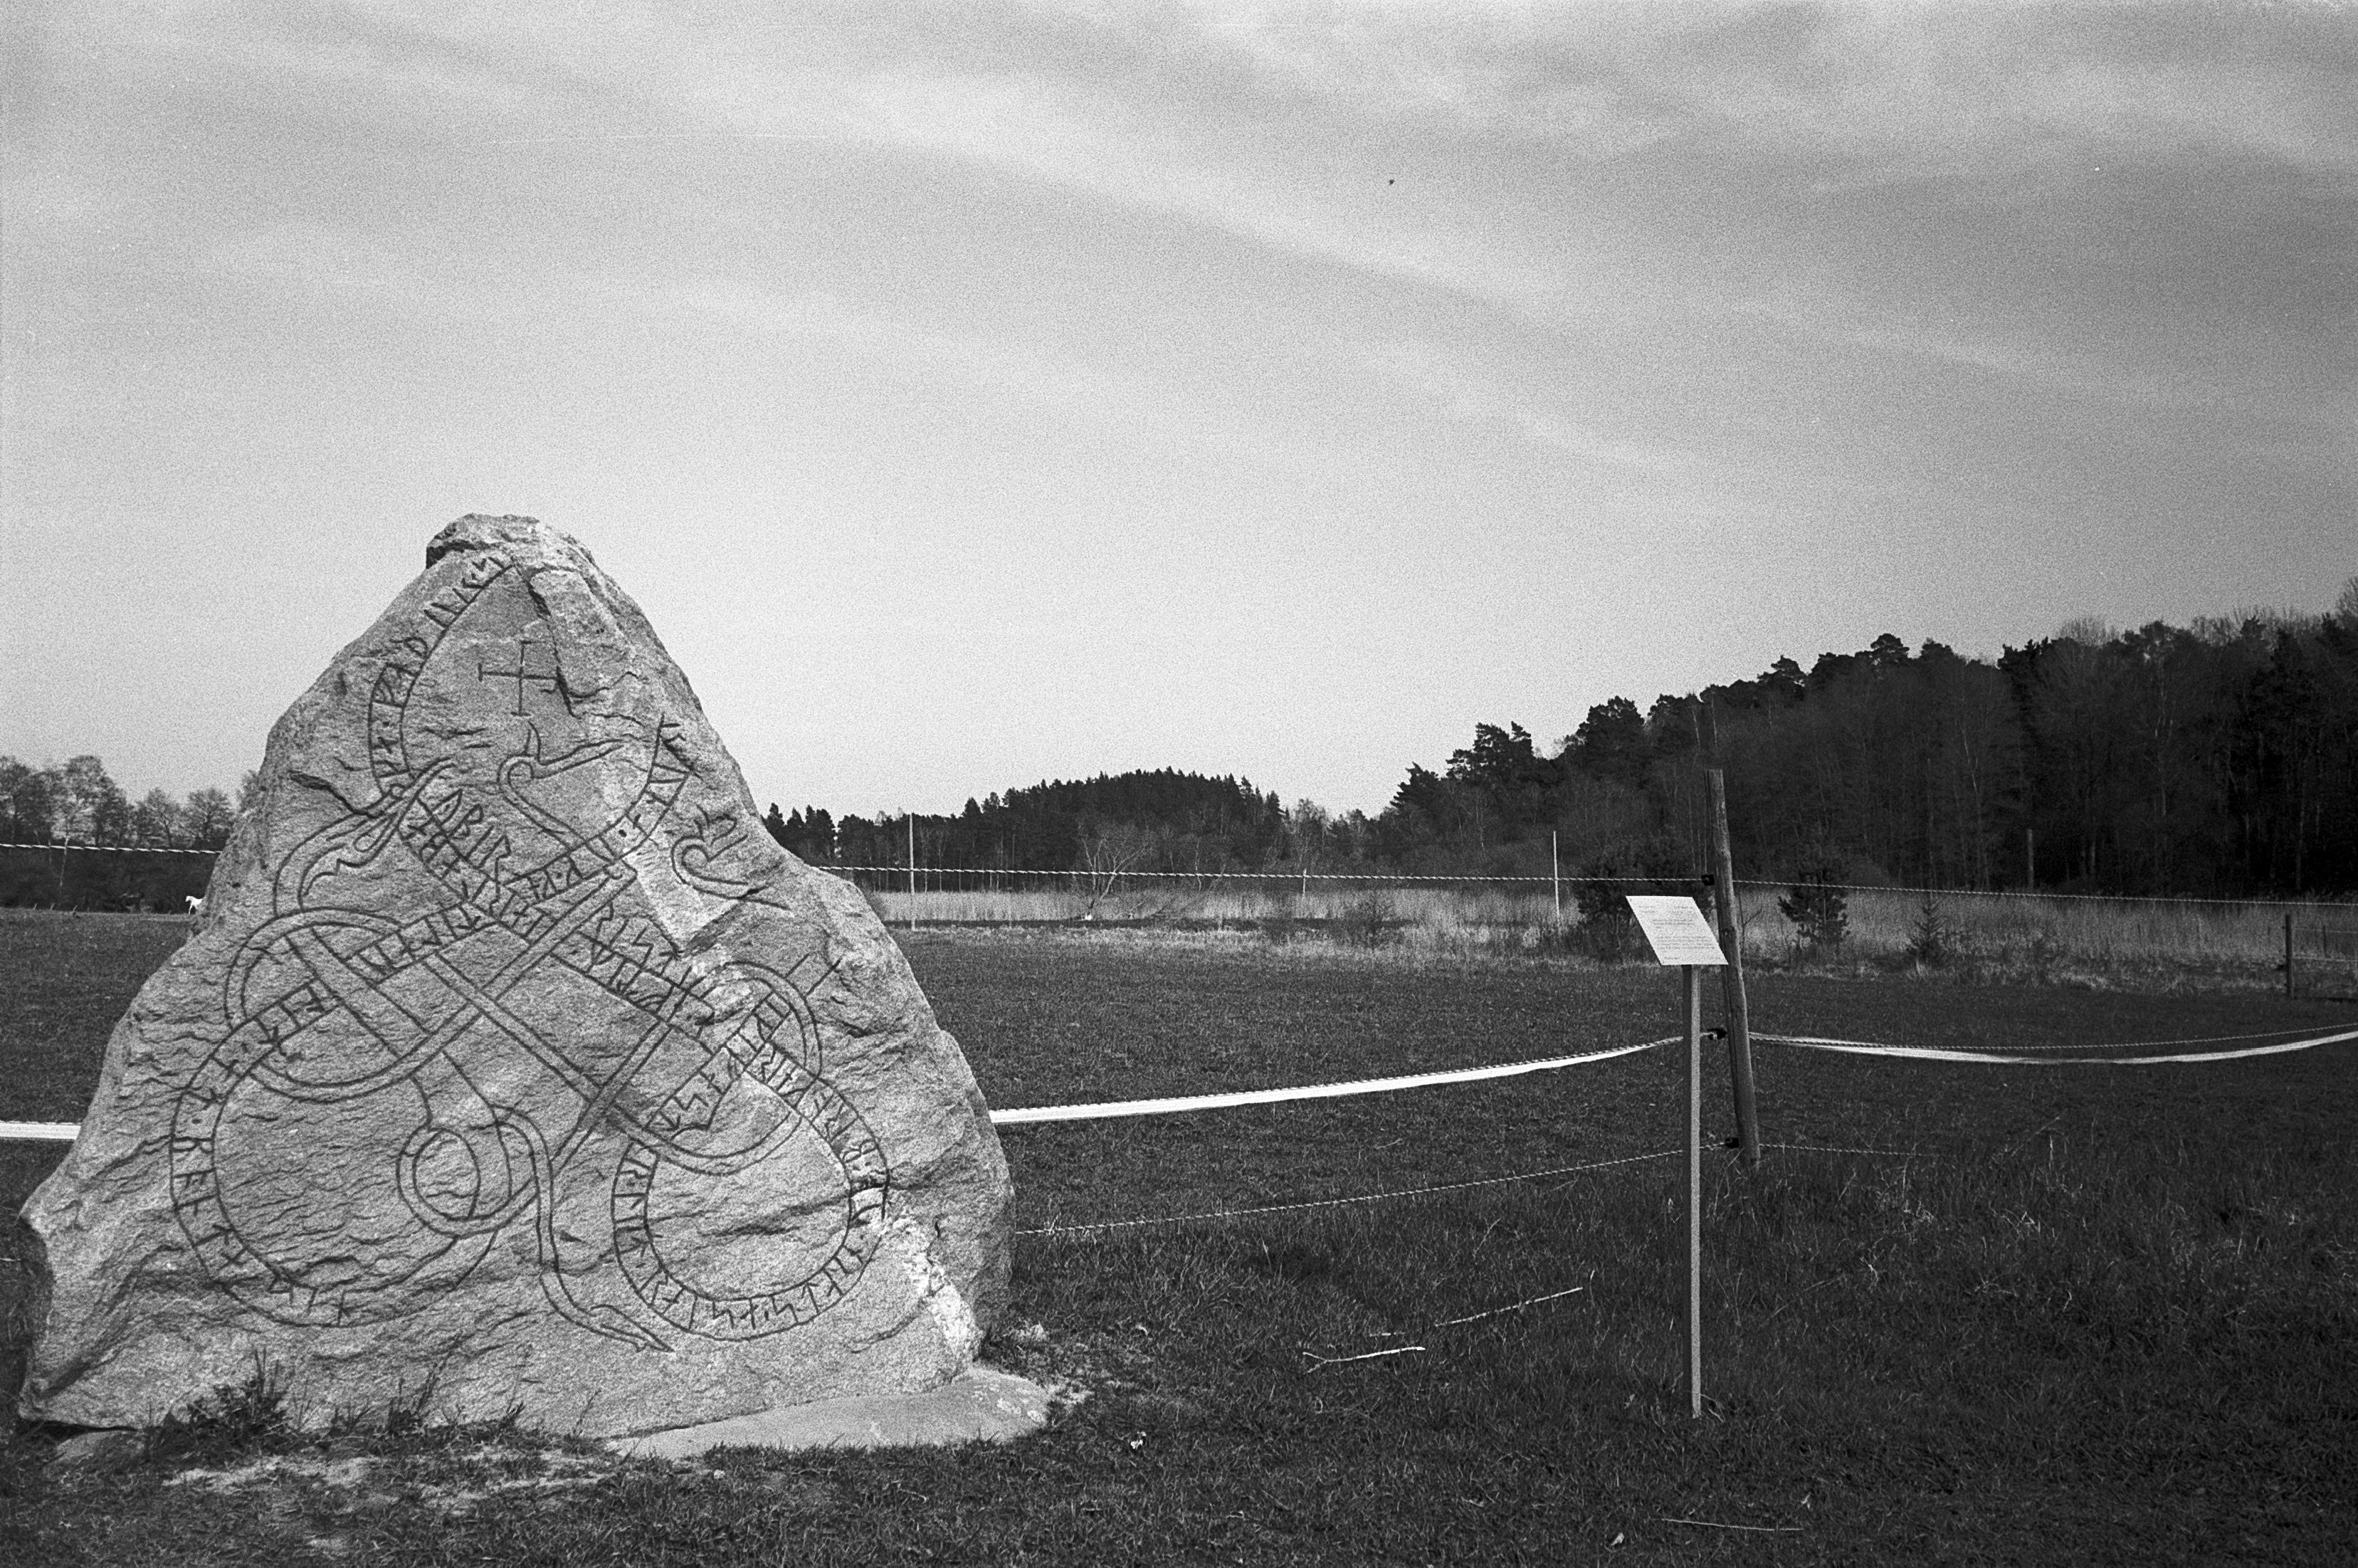 Stone plinth at burial mound (Pic: Skoge Farman)